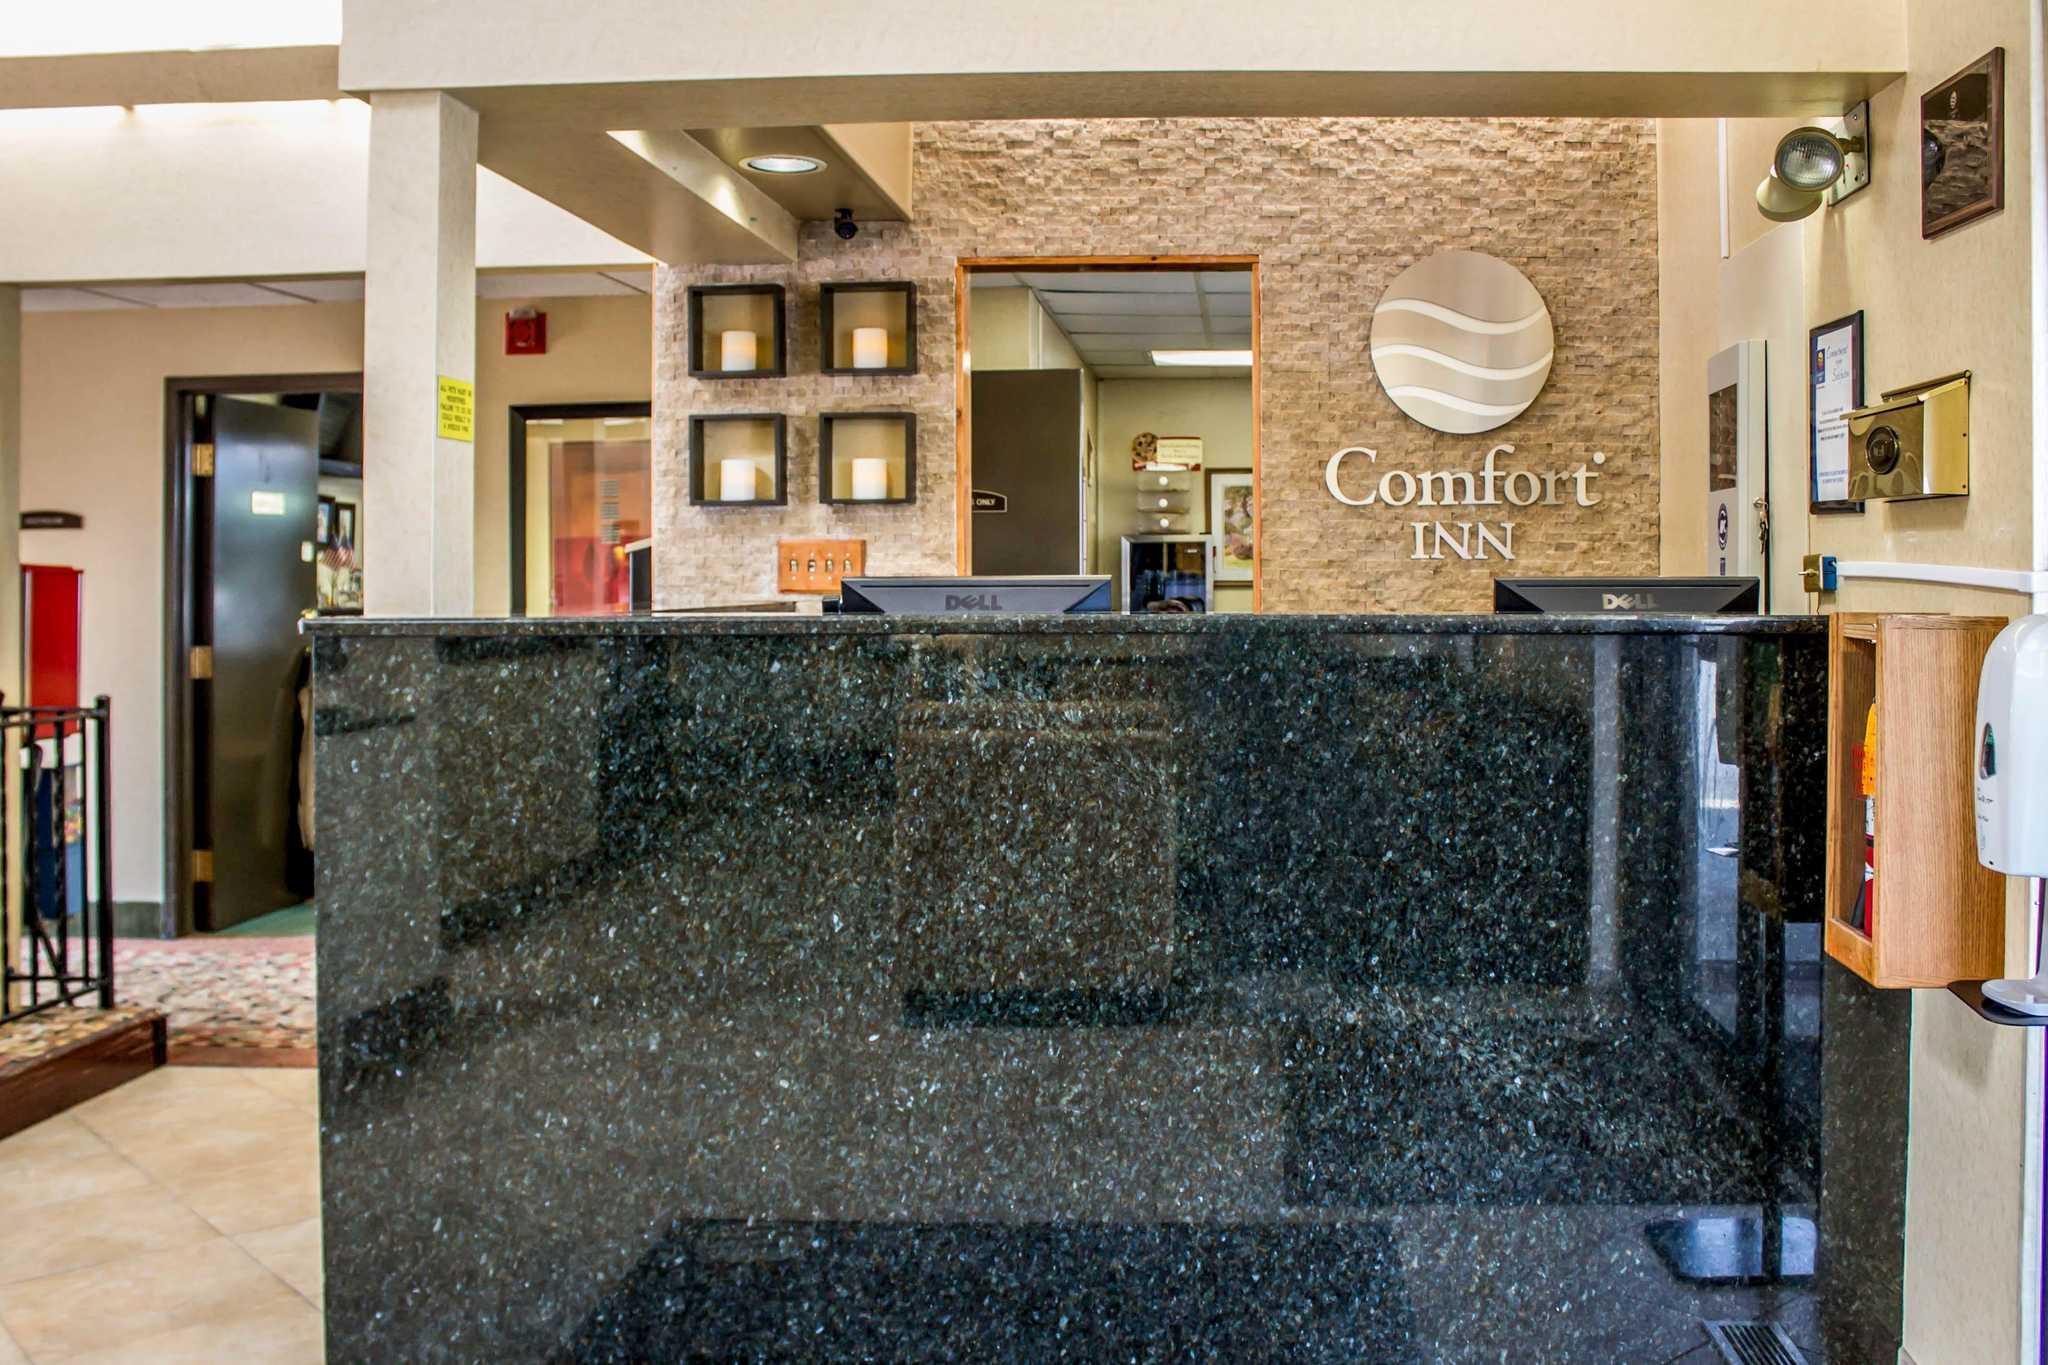 Comfort Inn East image 18